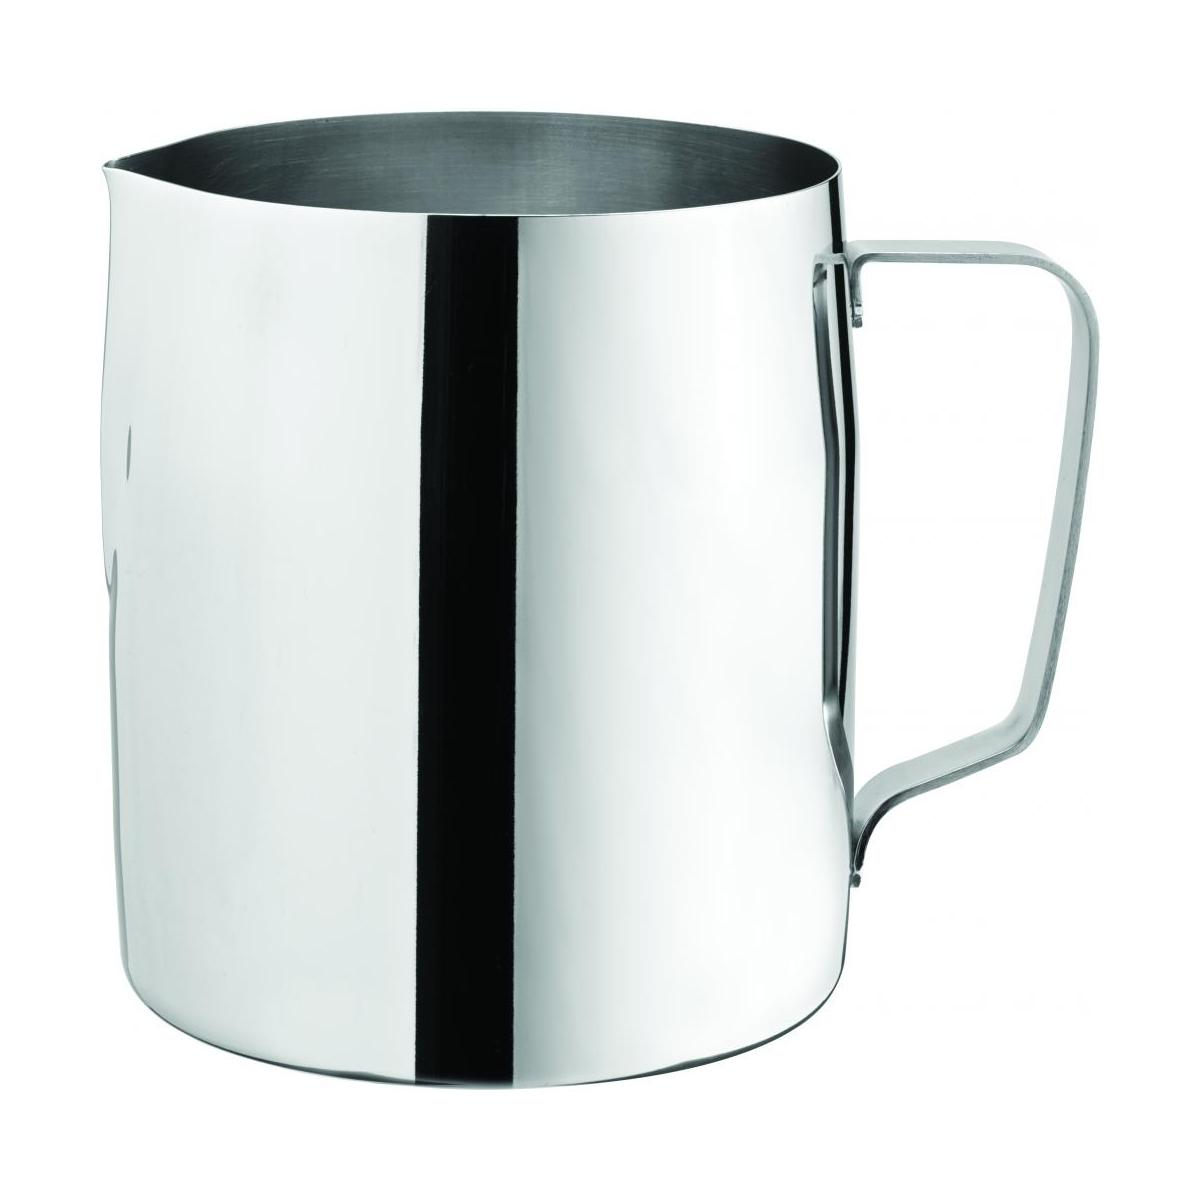 stainless steel milk frothing jug 58oz 165cl noble express. Black Bedroom Furniture Sets. Home Design Ideas